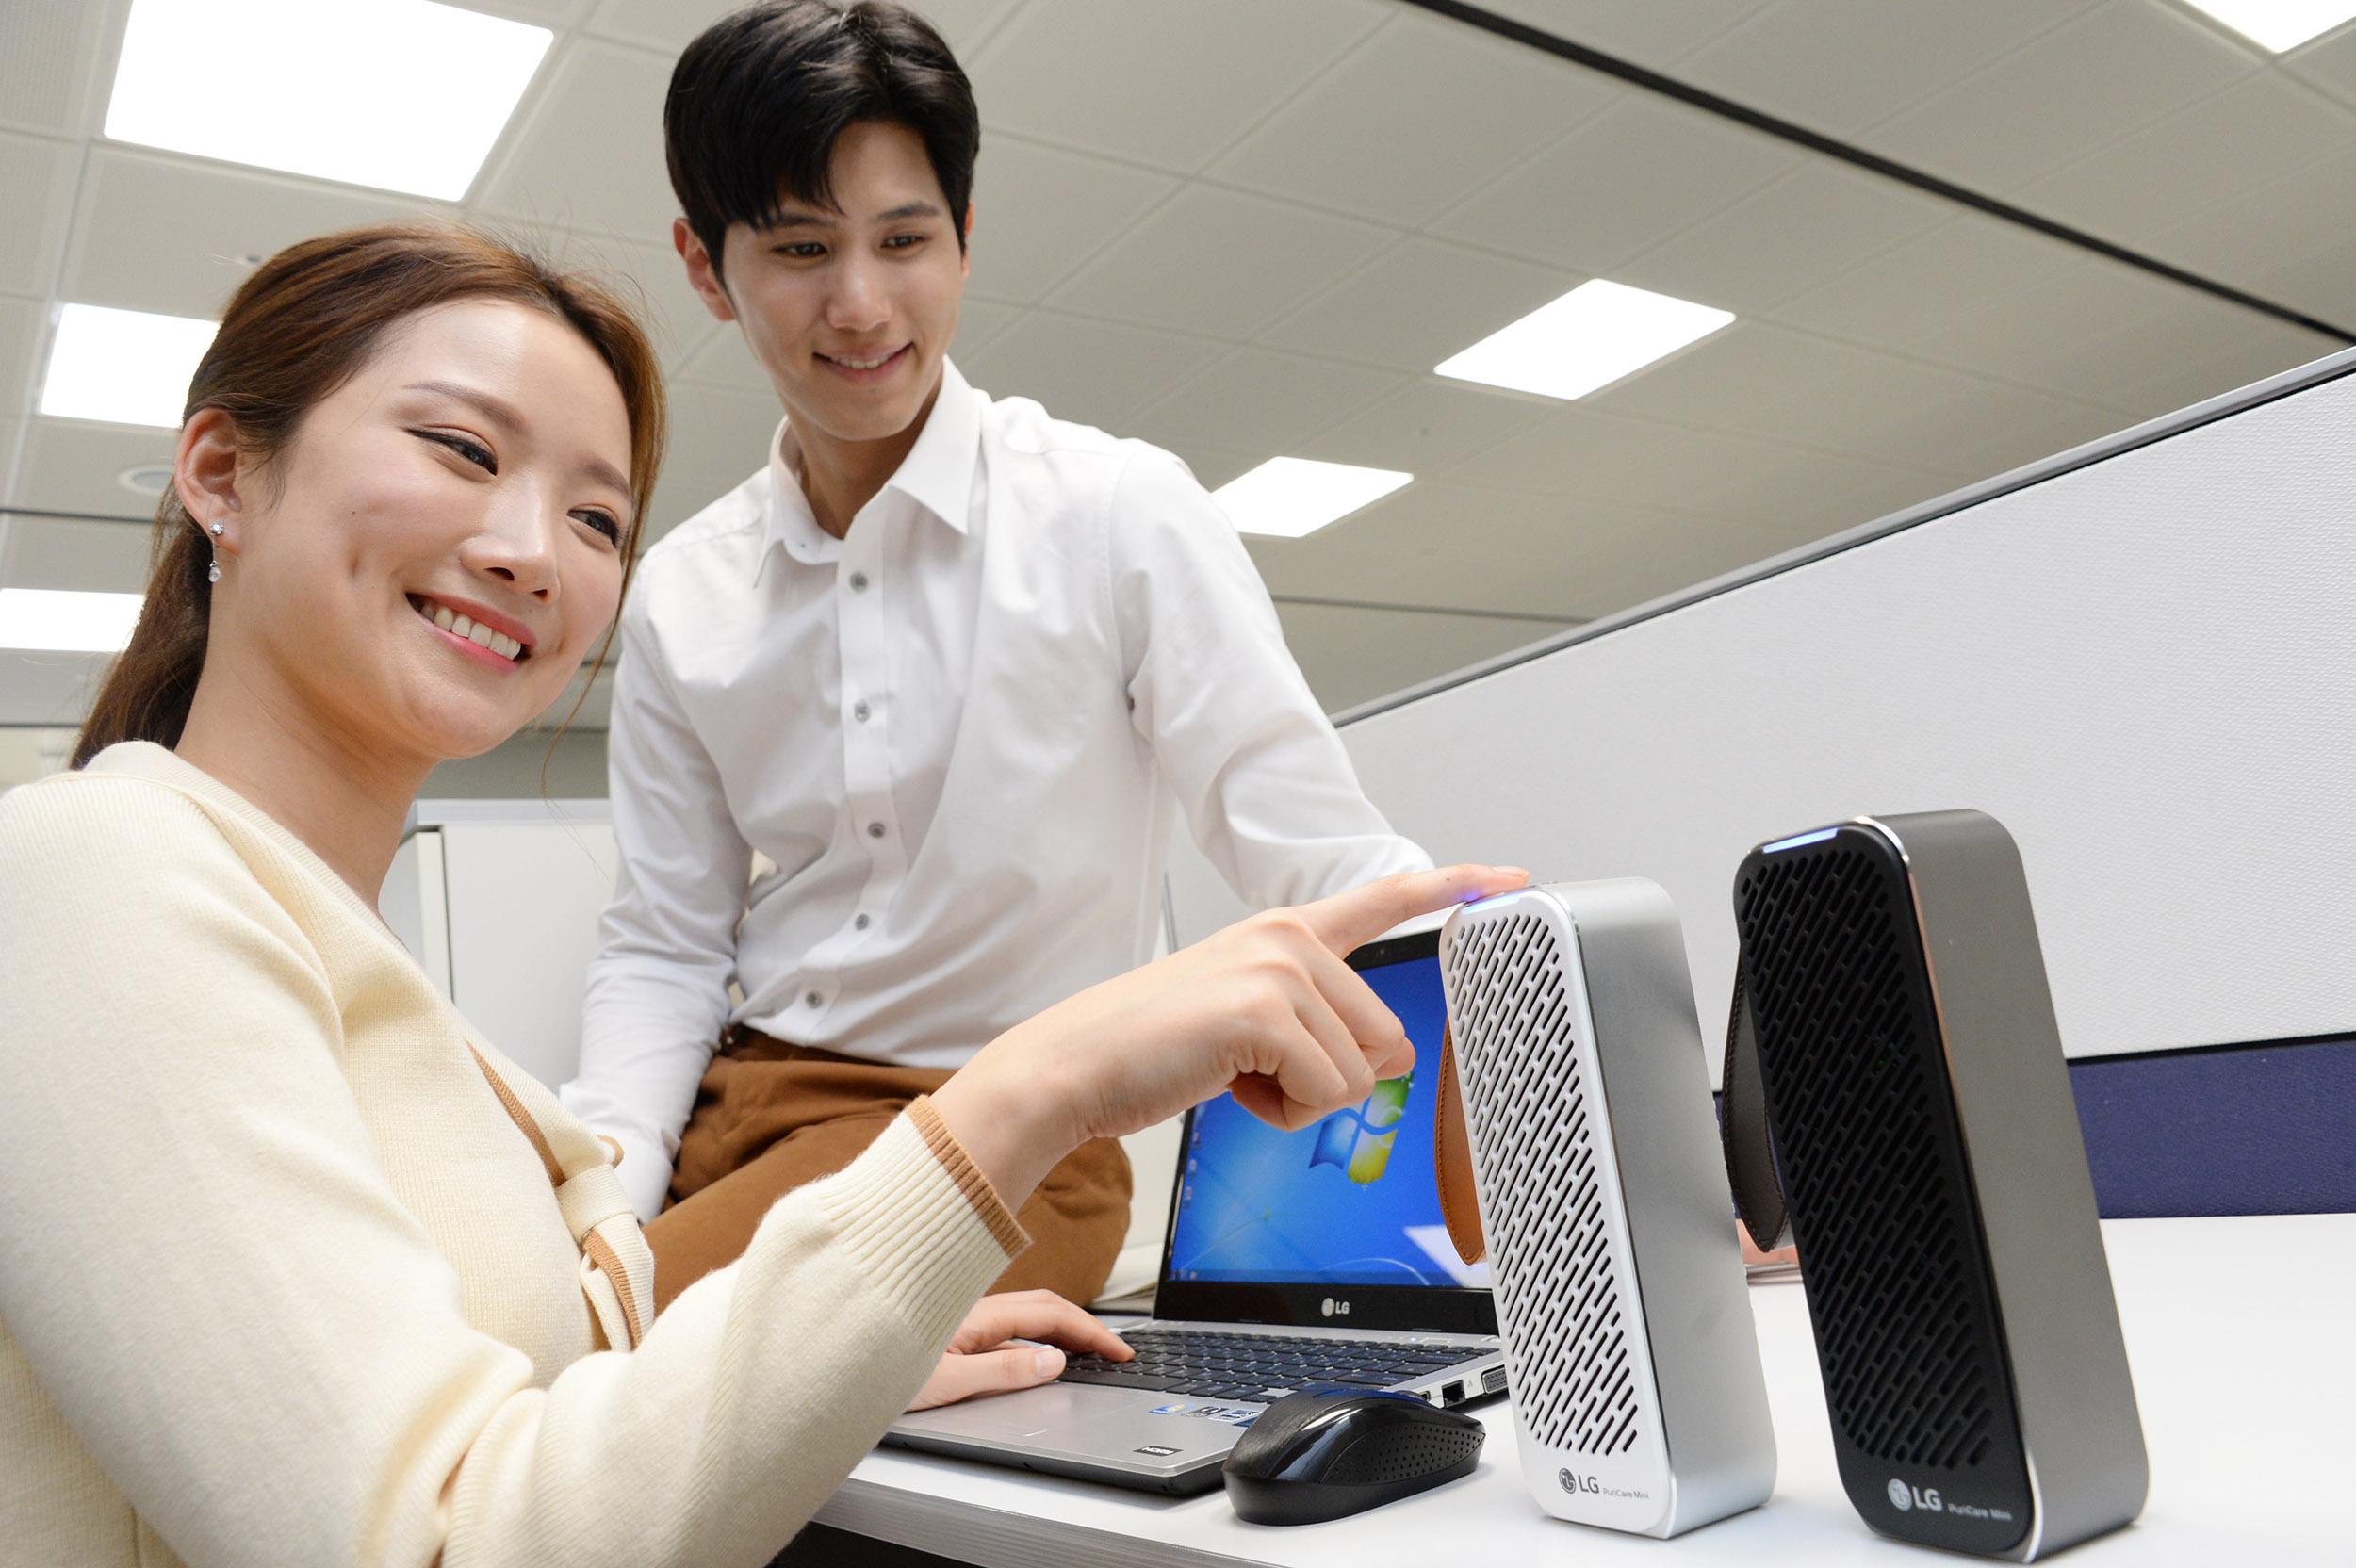 LG전자가 22일 휴대용 공기청정기 'LG 퓨리케어 미니 공기청정기'를 출시한다. 사진은 모델이 사무실에서 LG 퓨리케어 미니 공기청정기를 가리키는 모습